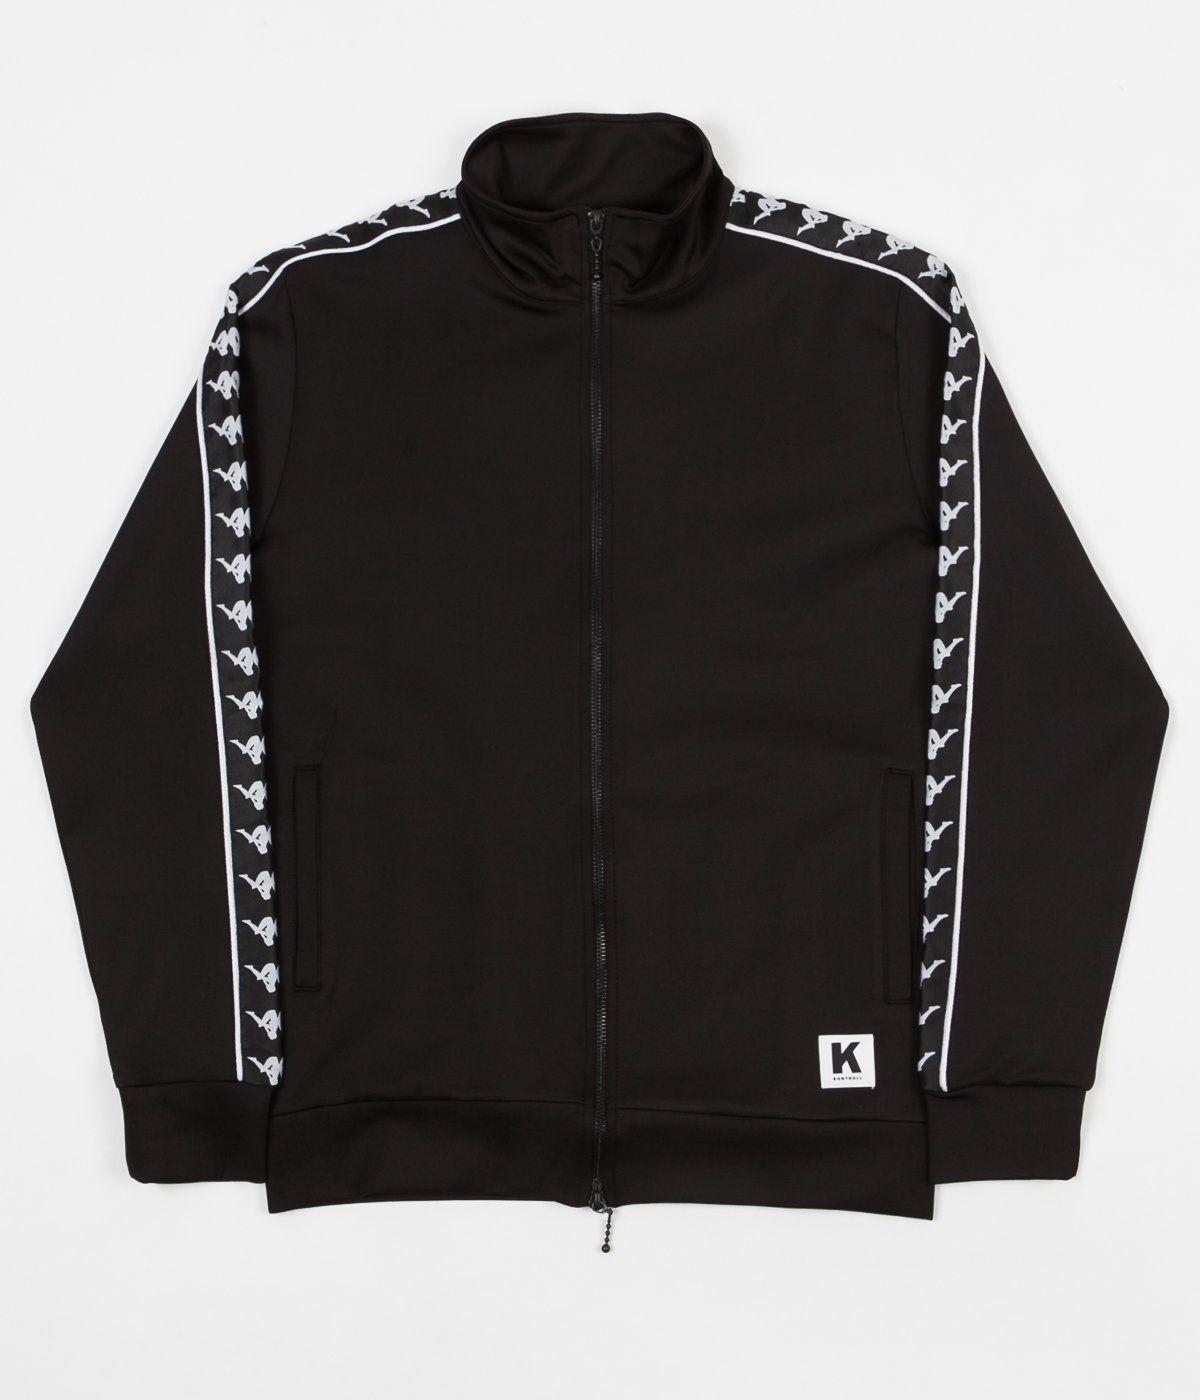 7b82767f03675 Kappa Kontroll Banda Jacket - Black